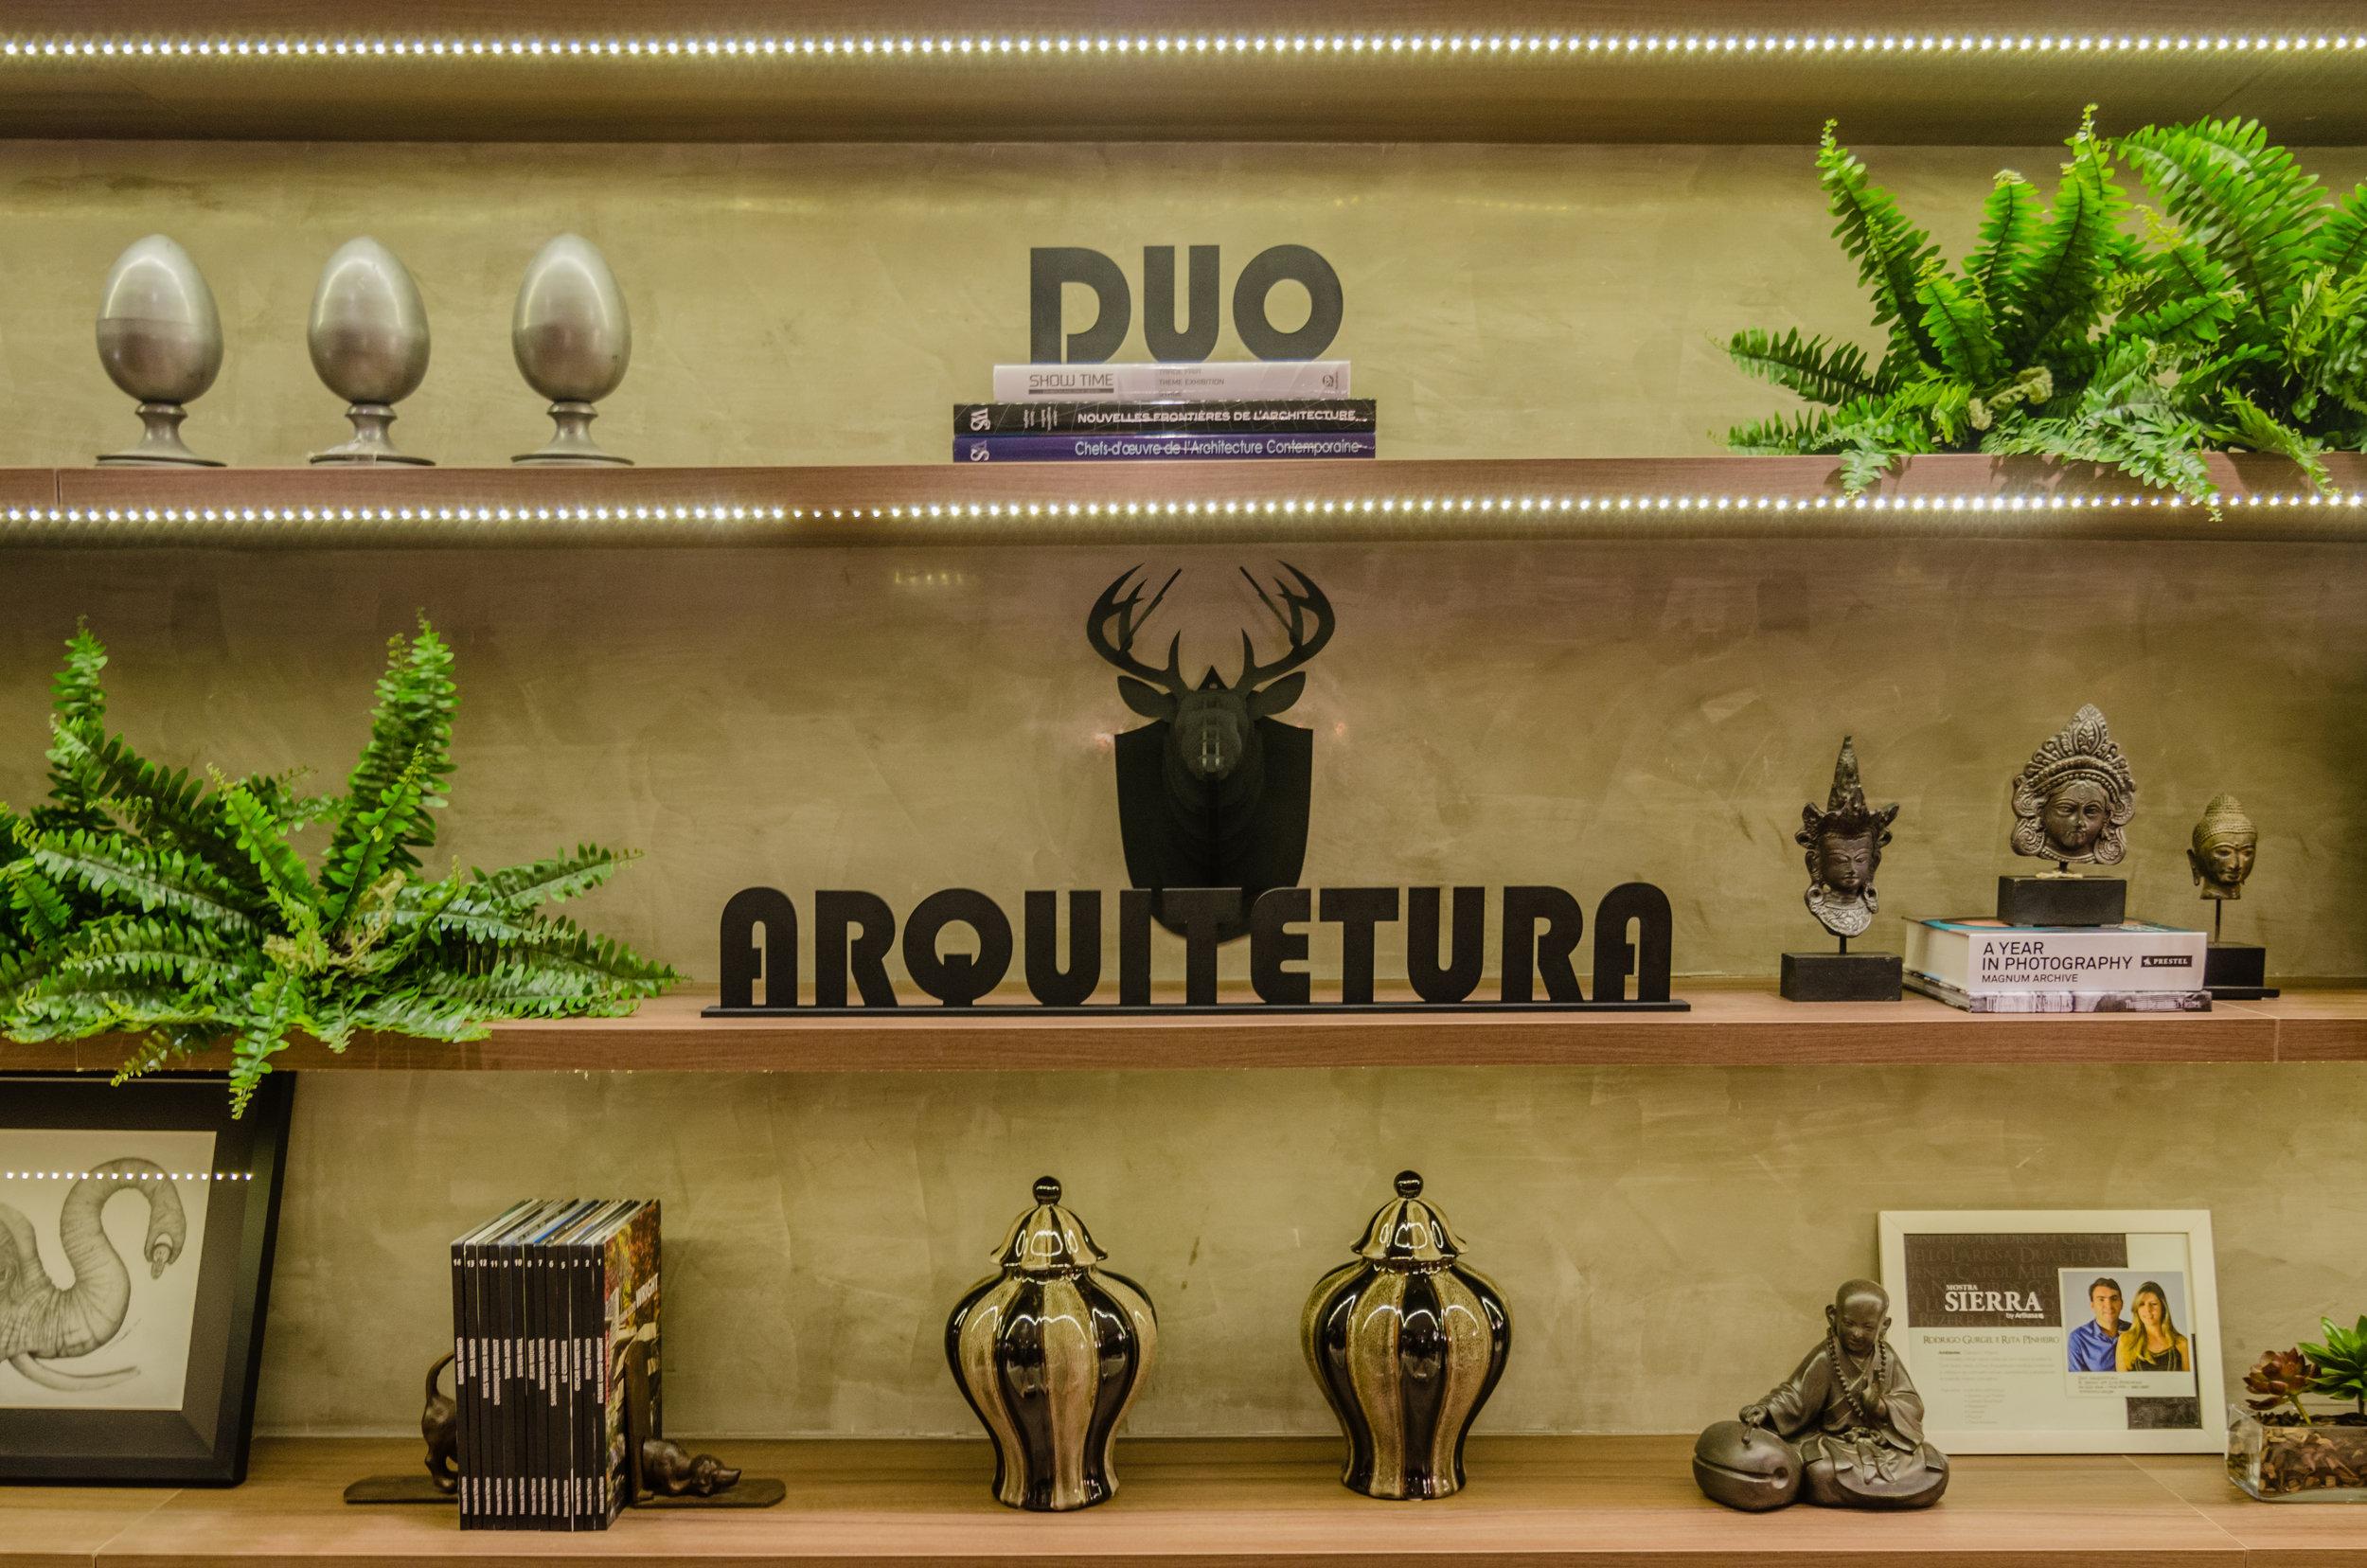 projeto-arquitetonico-mostrasierra-duo-arquitetura-mostra-04.jpg